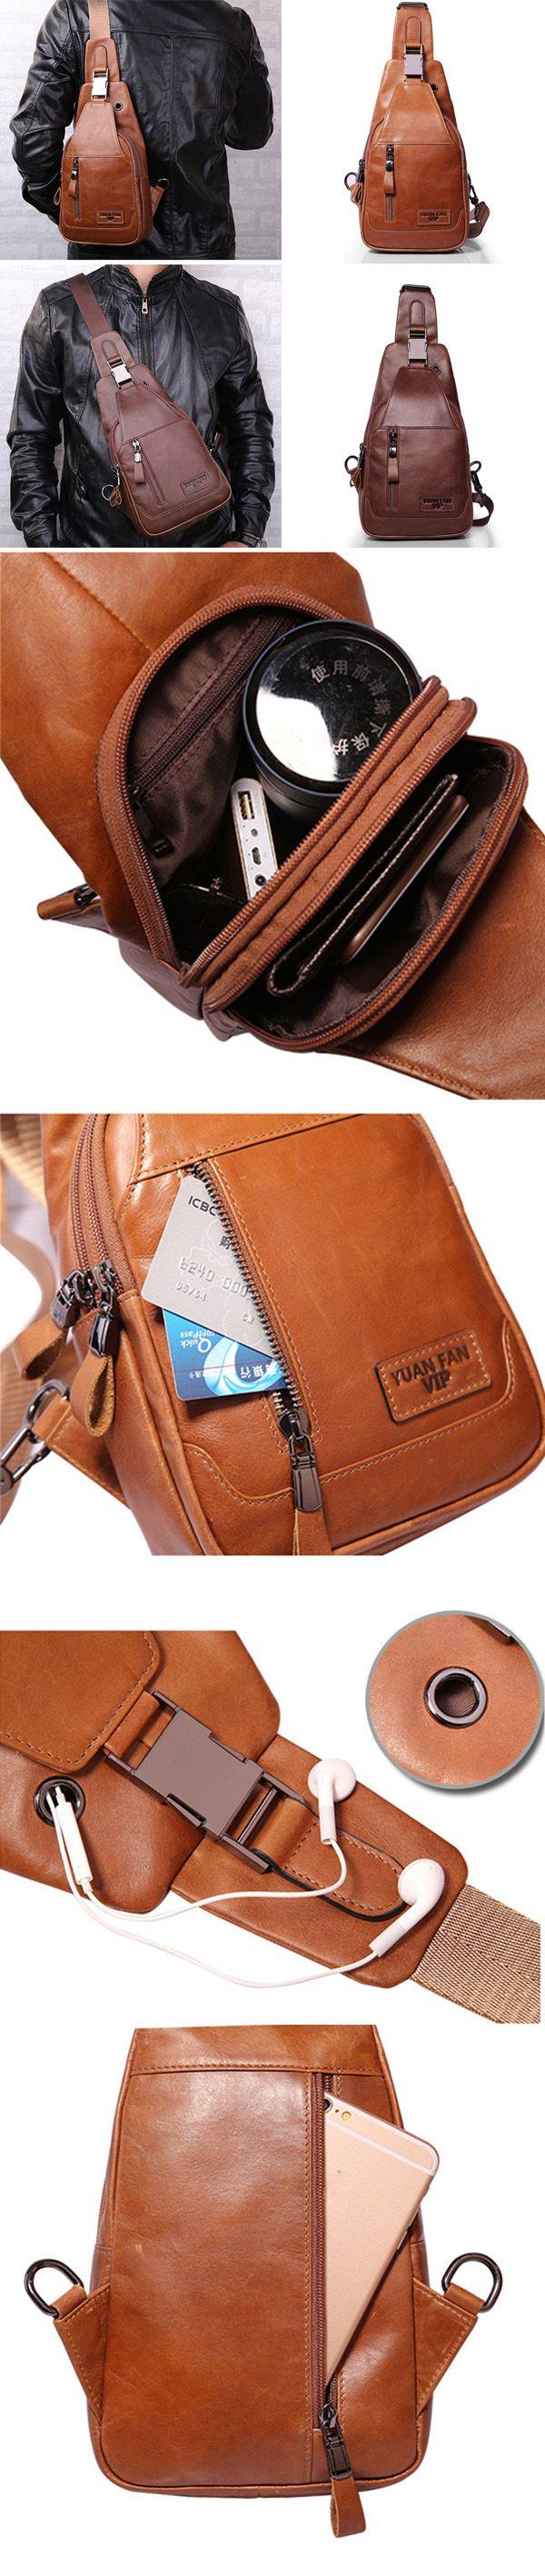 US$34.25 Ekphero Men Genuine Leather Shoulder Bag_ Vintage Chest Bags_ Leather Crossbody Bags For Men